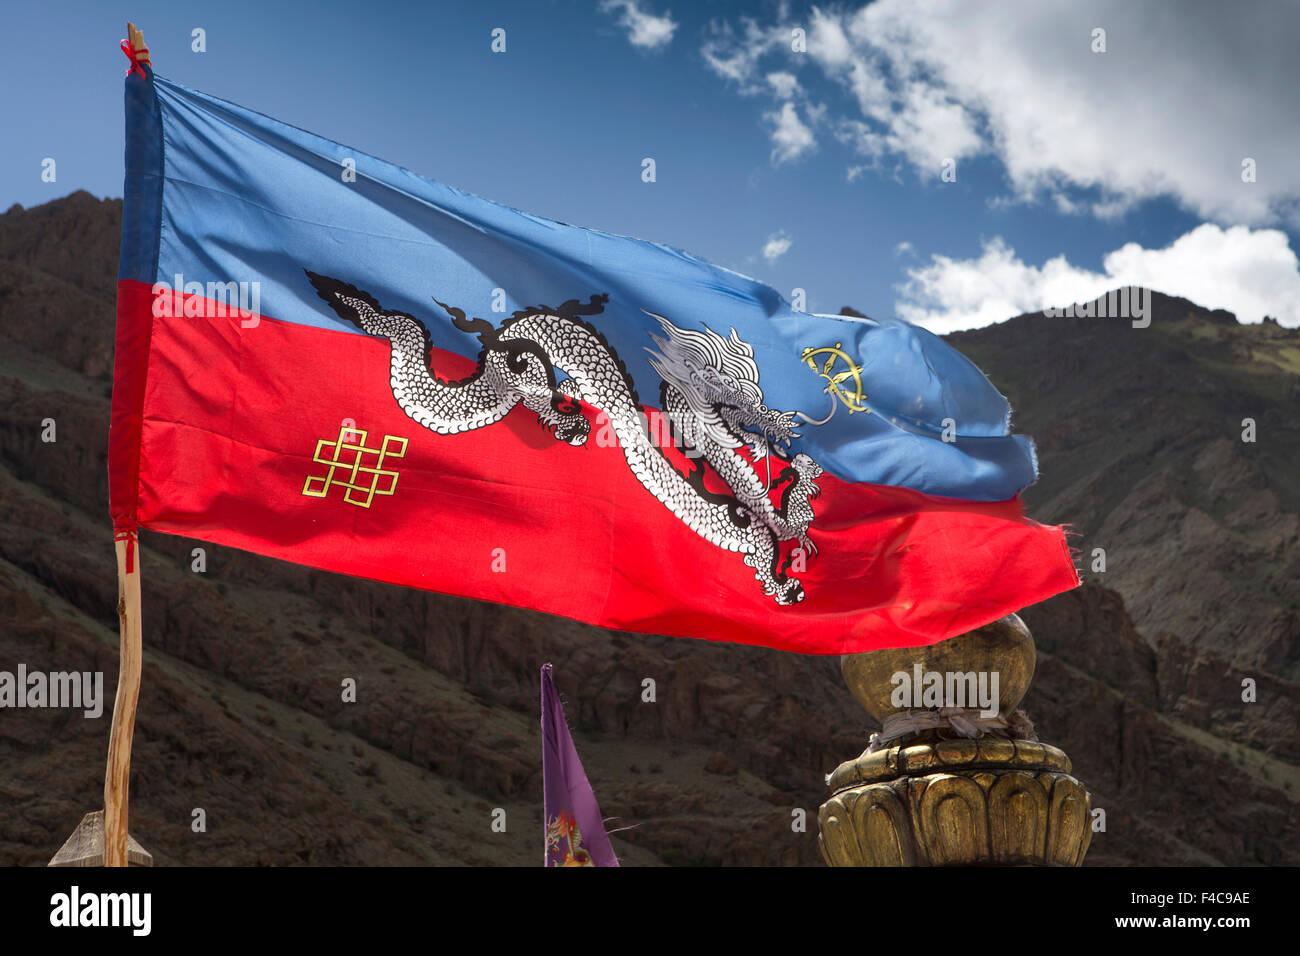 India, Jammu & Kashmir, Ladakh, Hemis Gompa Monastery, Drukpa Buddhist tradition flag flying from roof - Stock Image